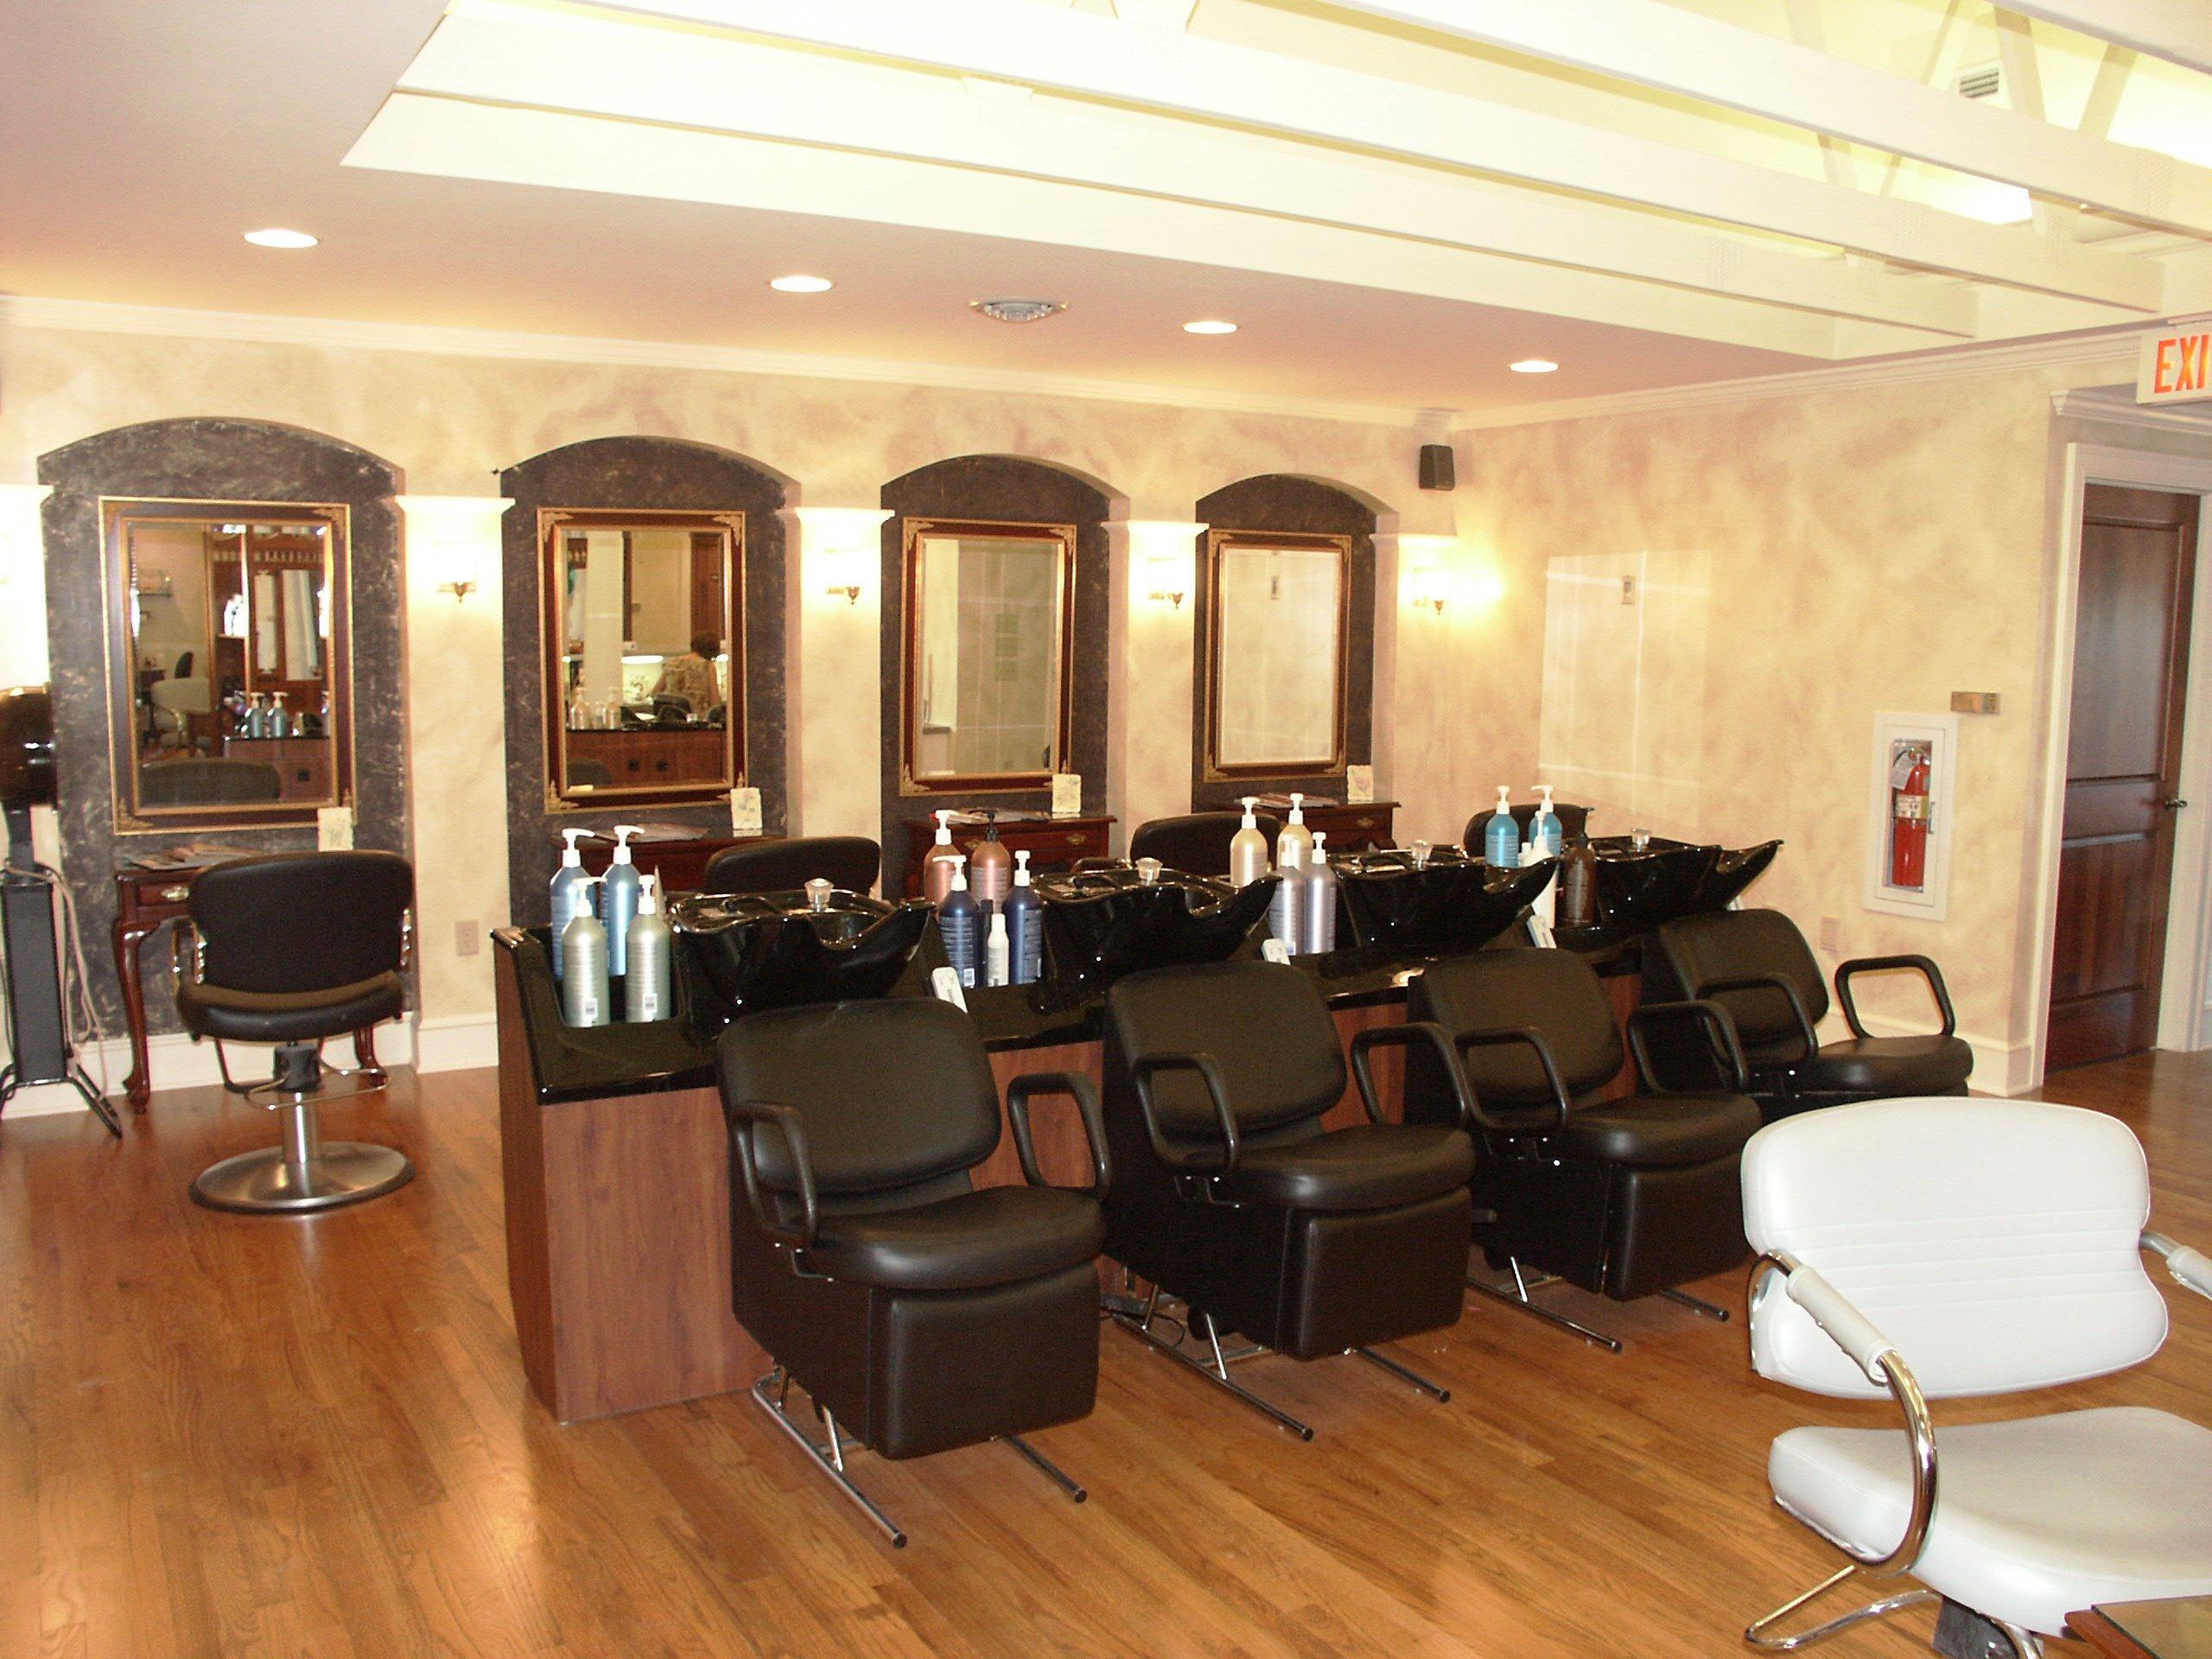 A shampoo or scalp massage